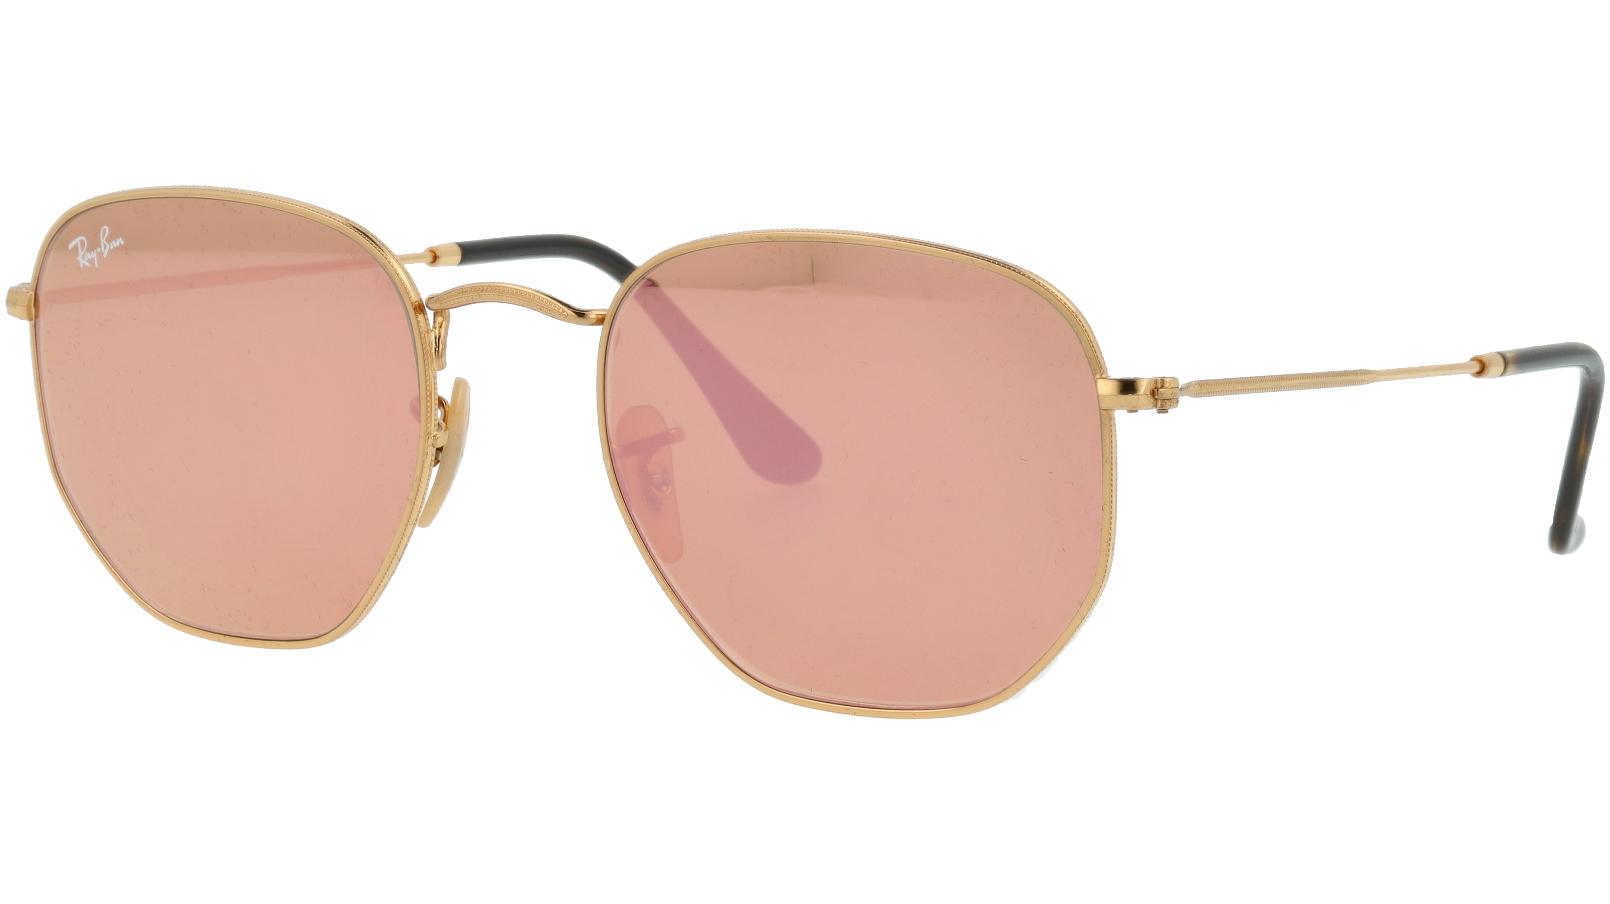 Ray-Ban RB3548N 001/Z2 54 Arista Hexagonal Sunglasses